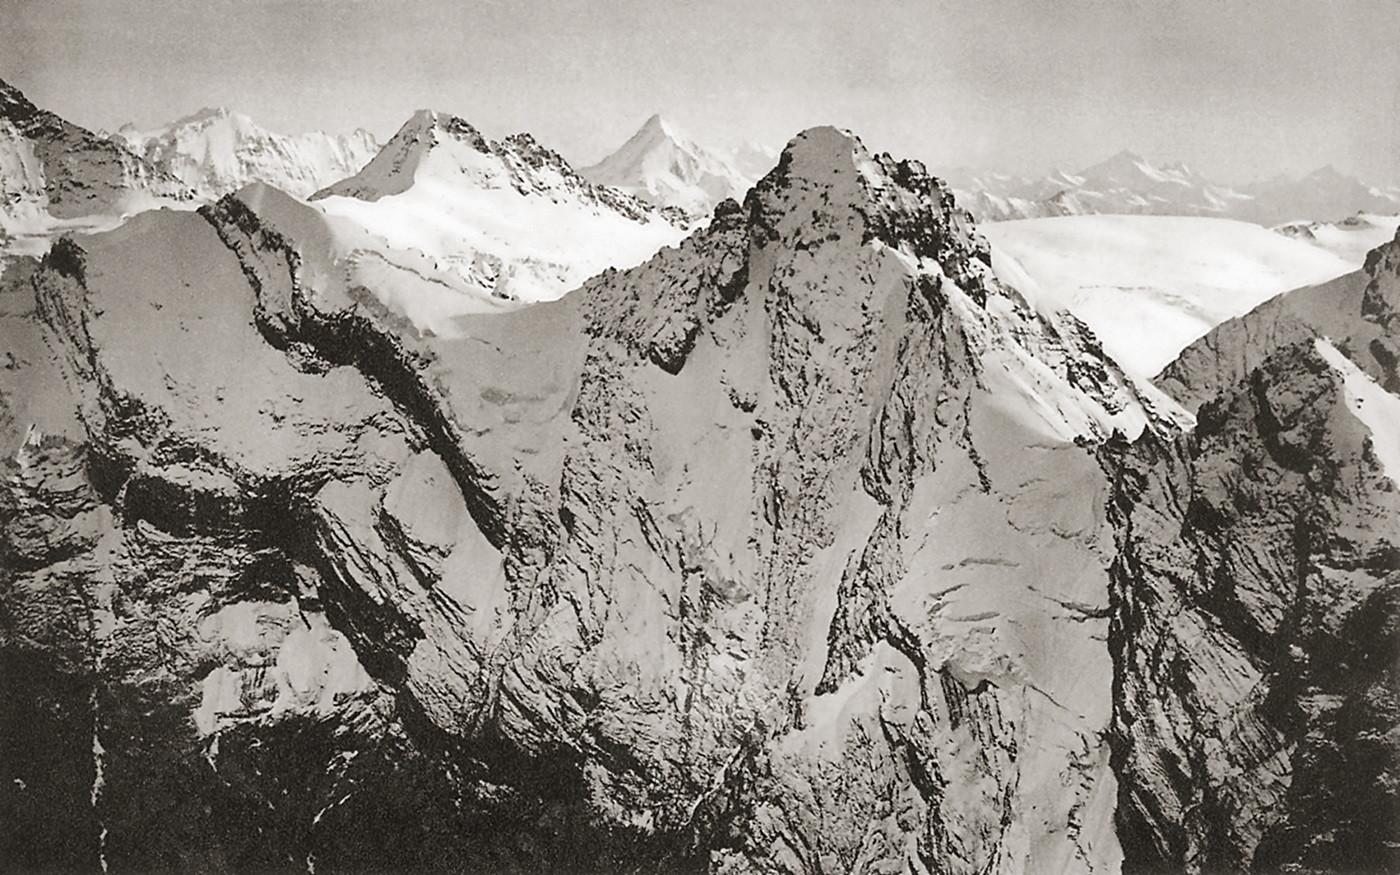 Gspaltenhorn, Tschingelhorn, et Bietschhorn , par Eduard Spelterini